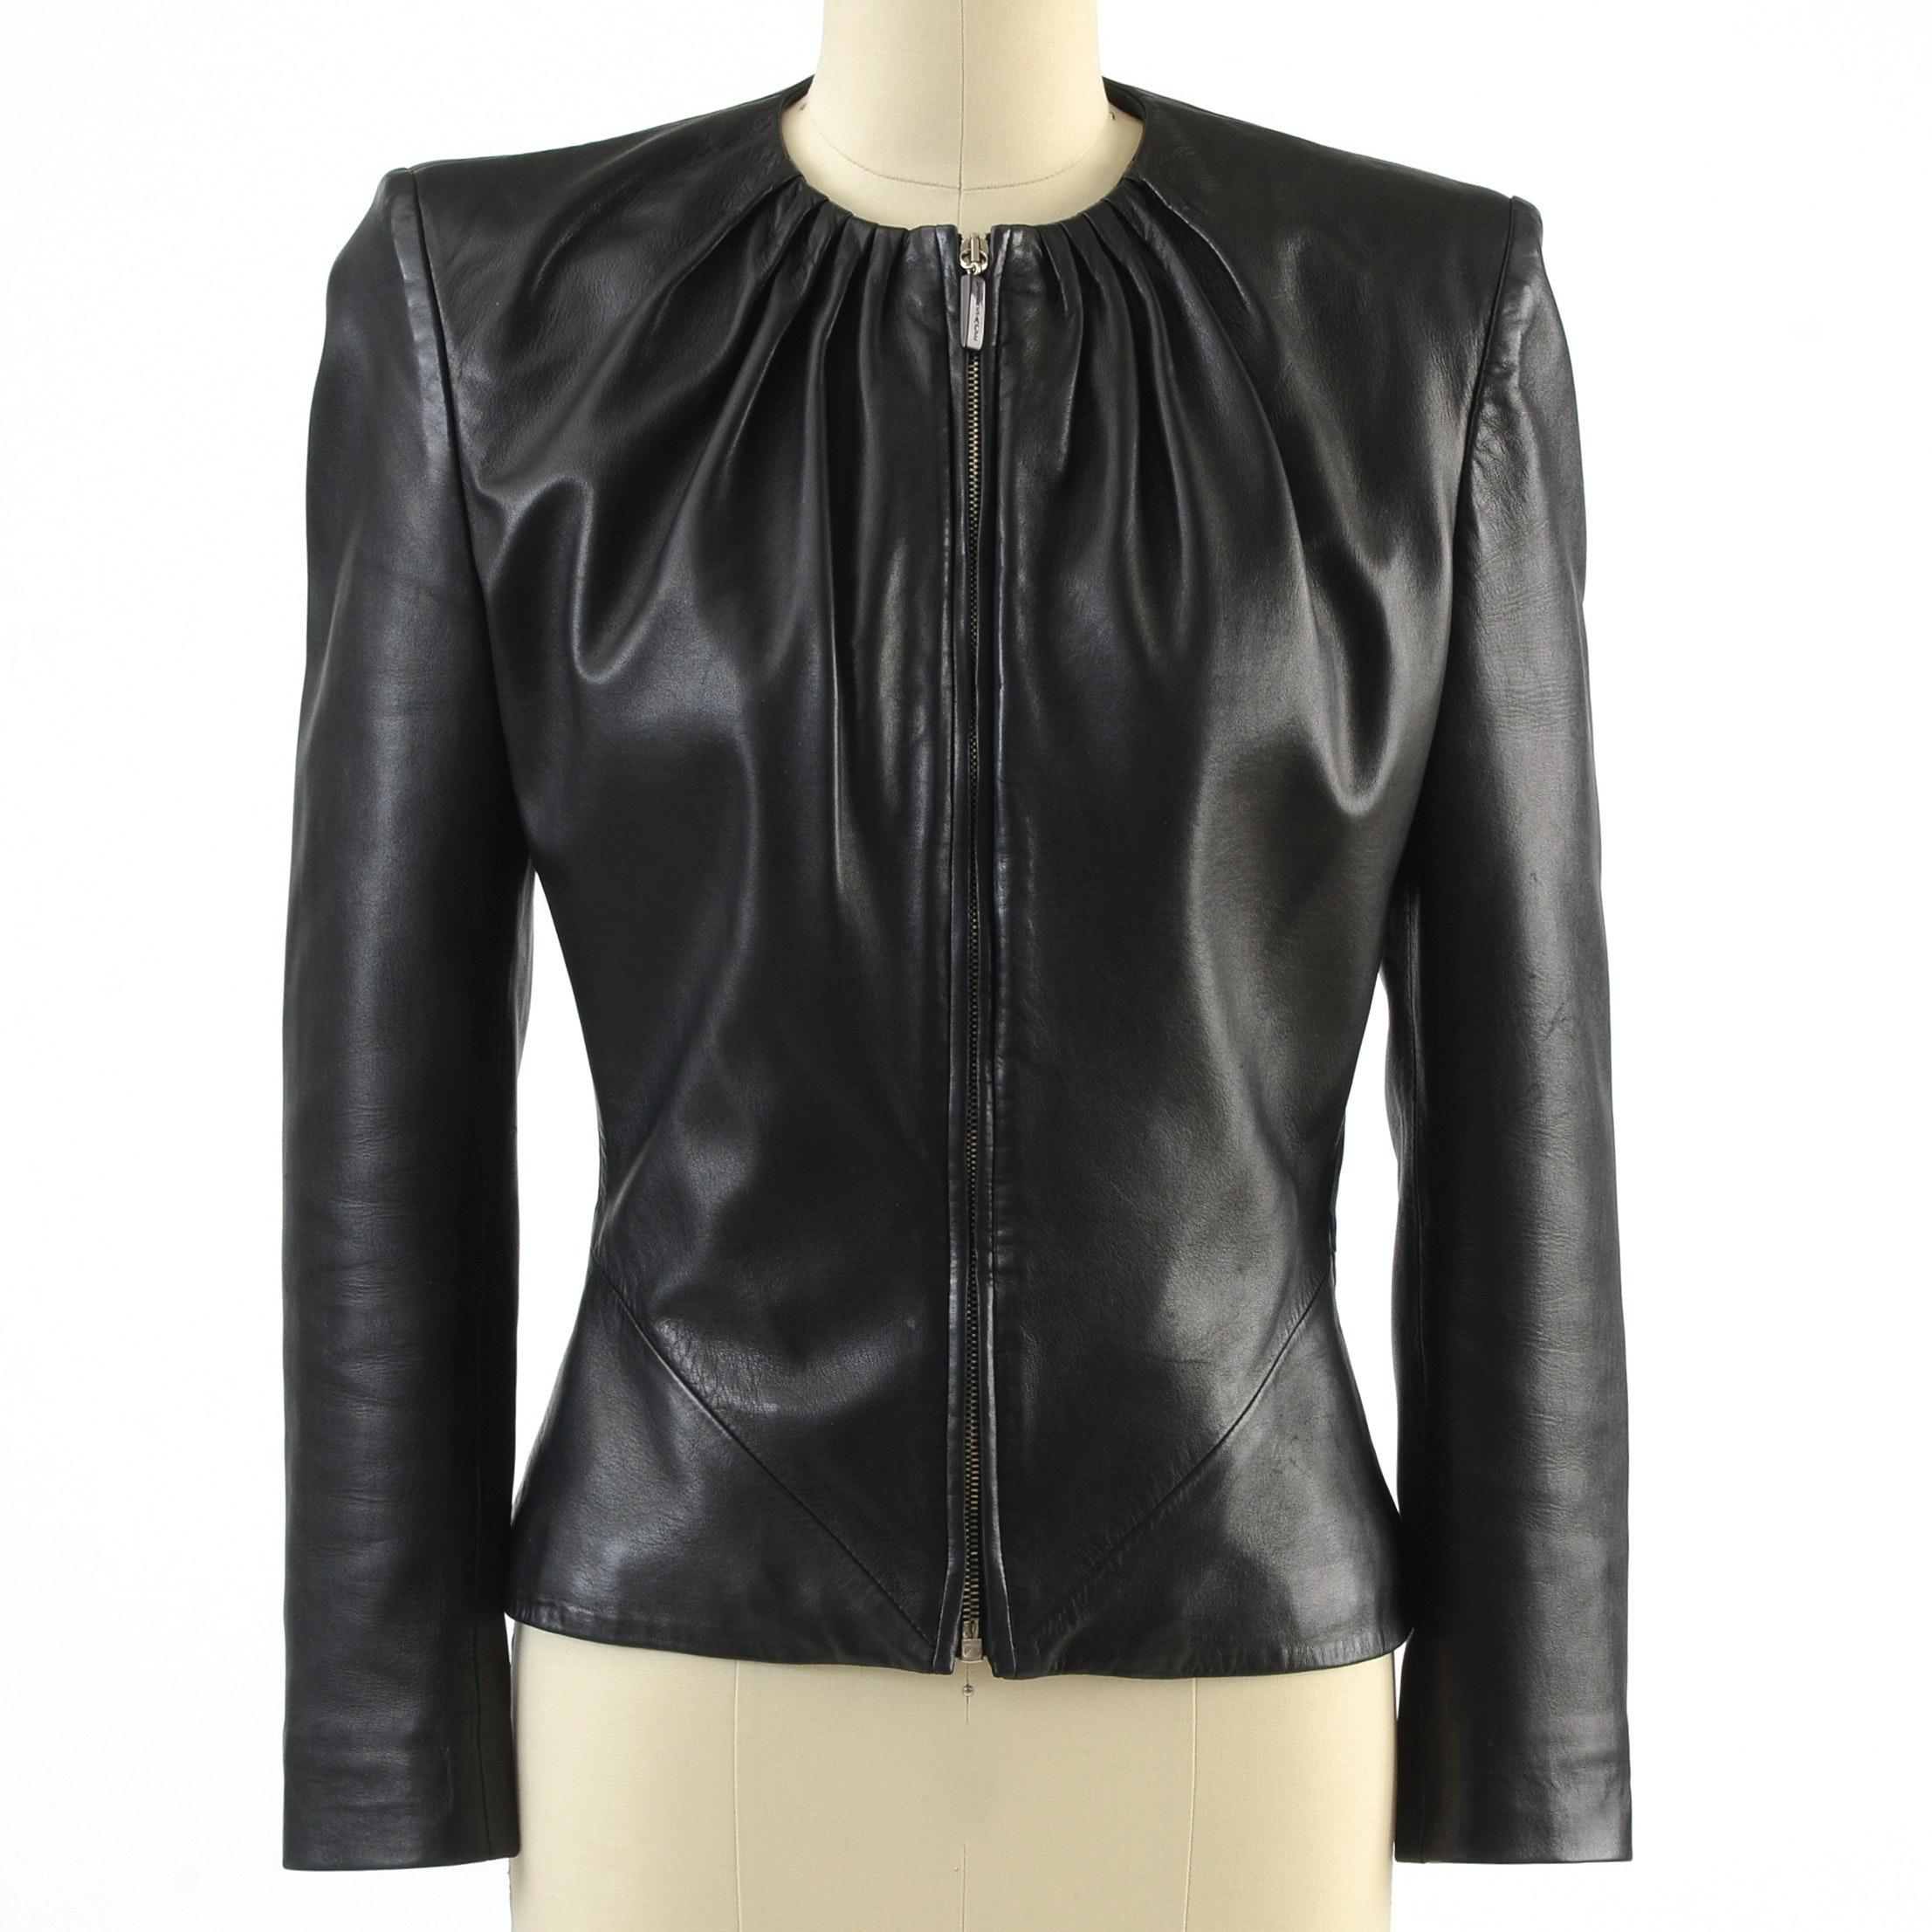 Gianni Versace Black Lambskin Leather Jacket